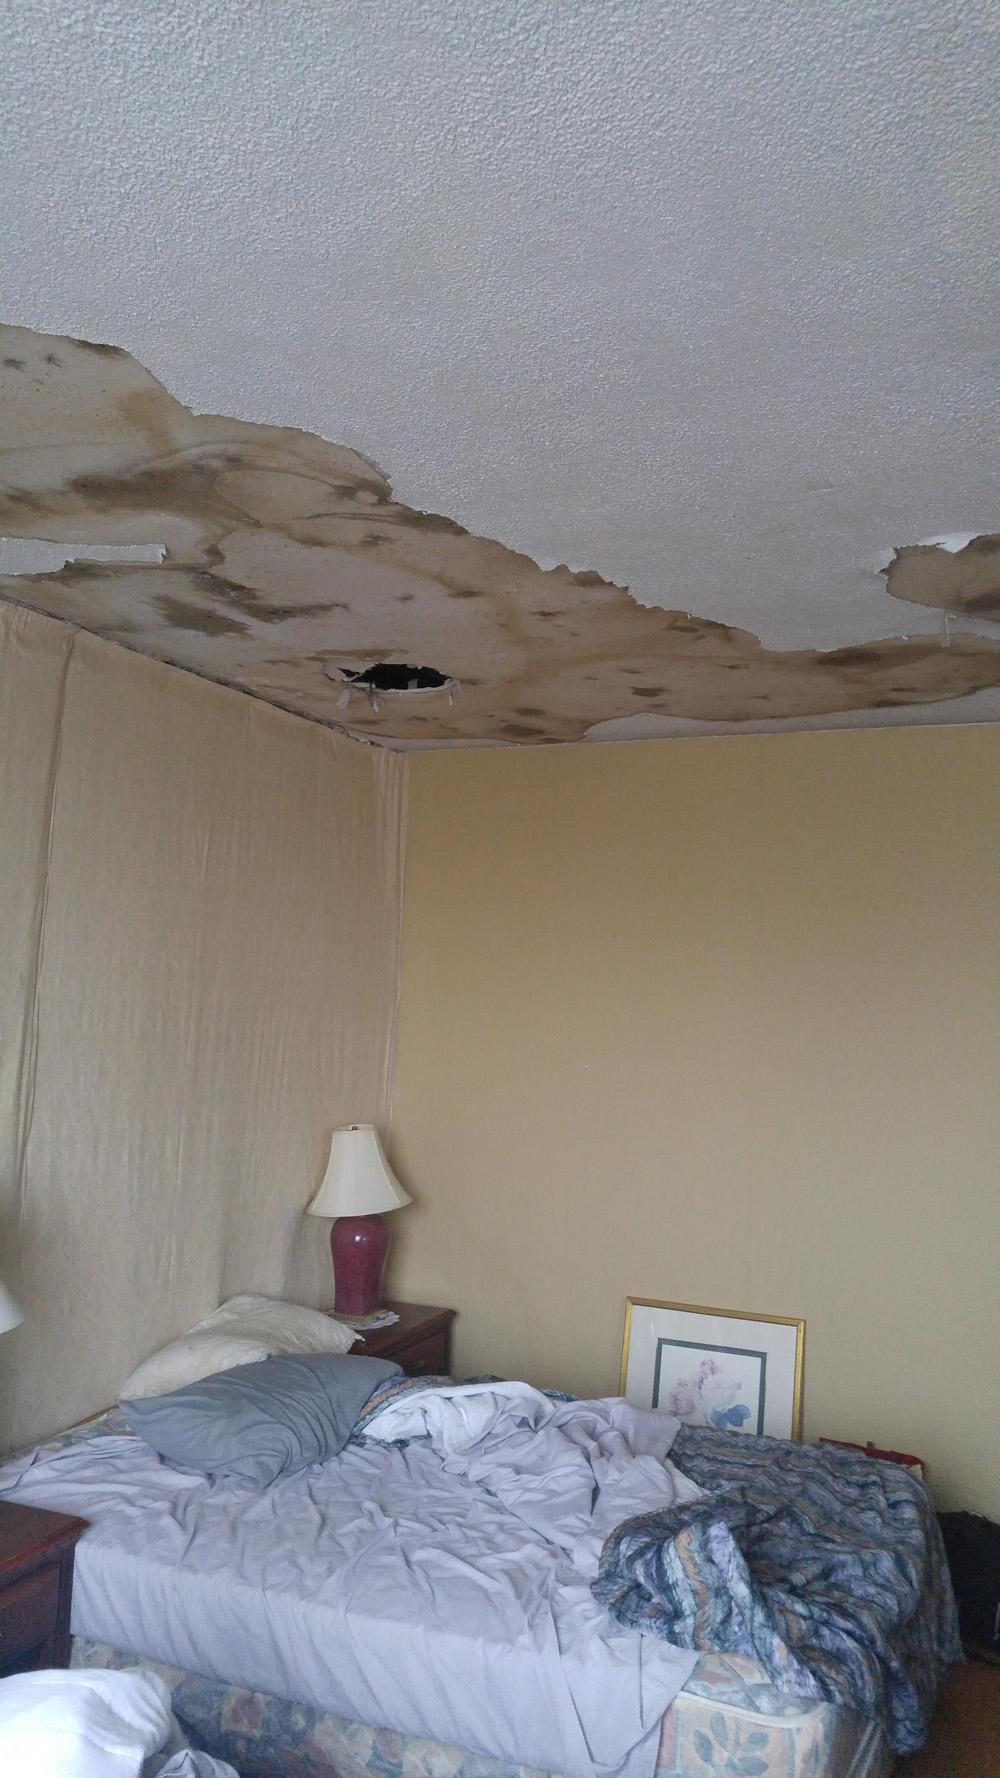 Our room in Sudbury